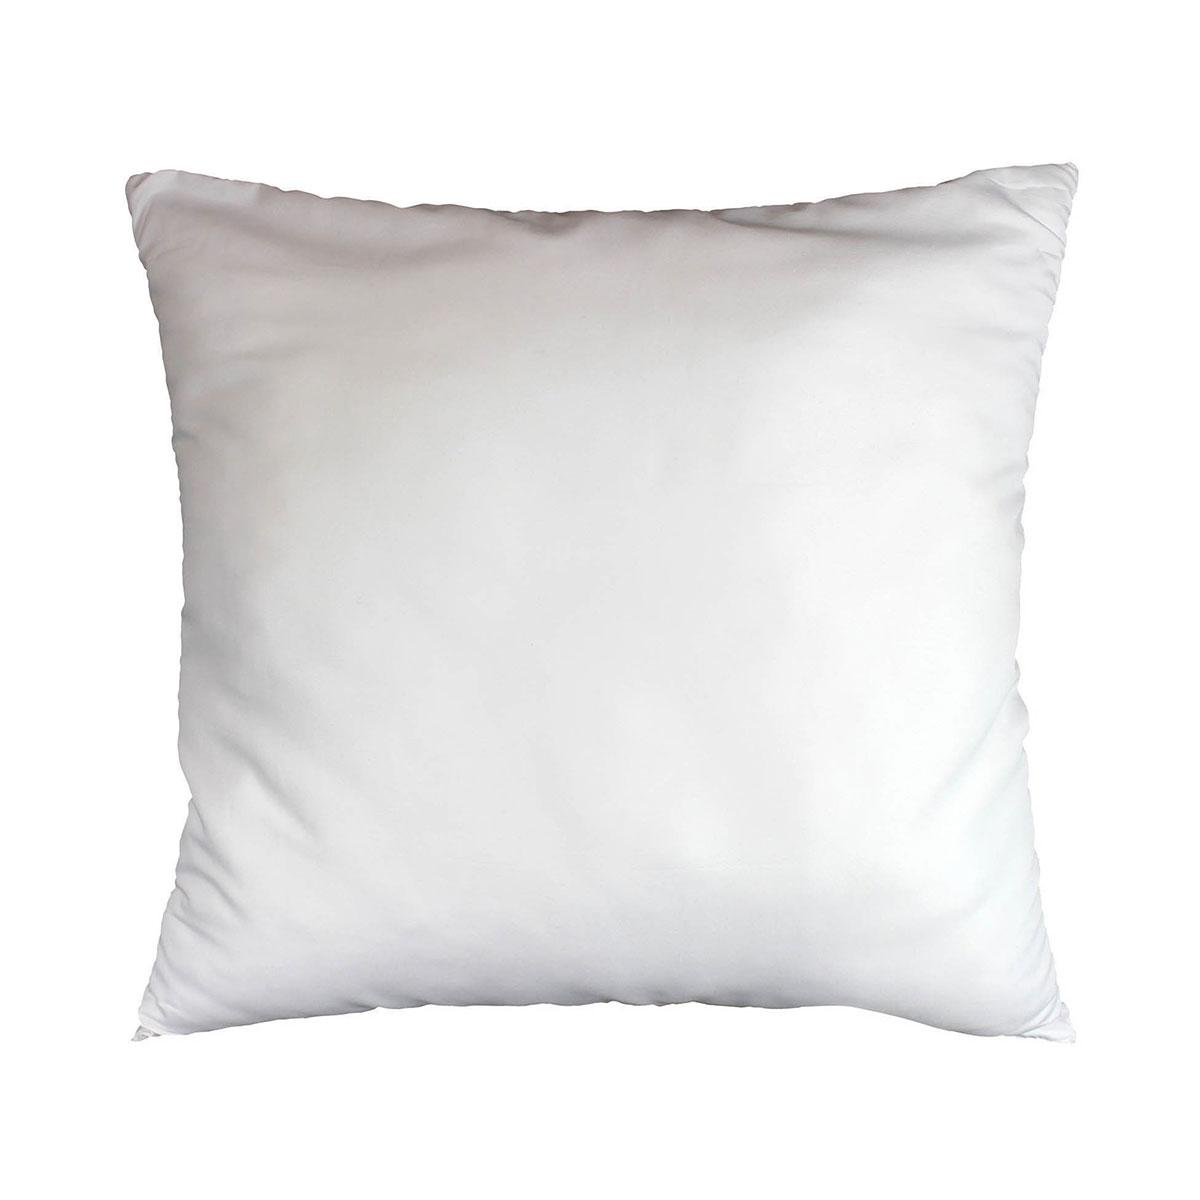 Oreiller uni anti acarien (Blanc)